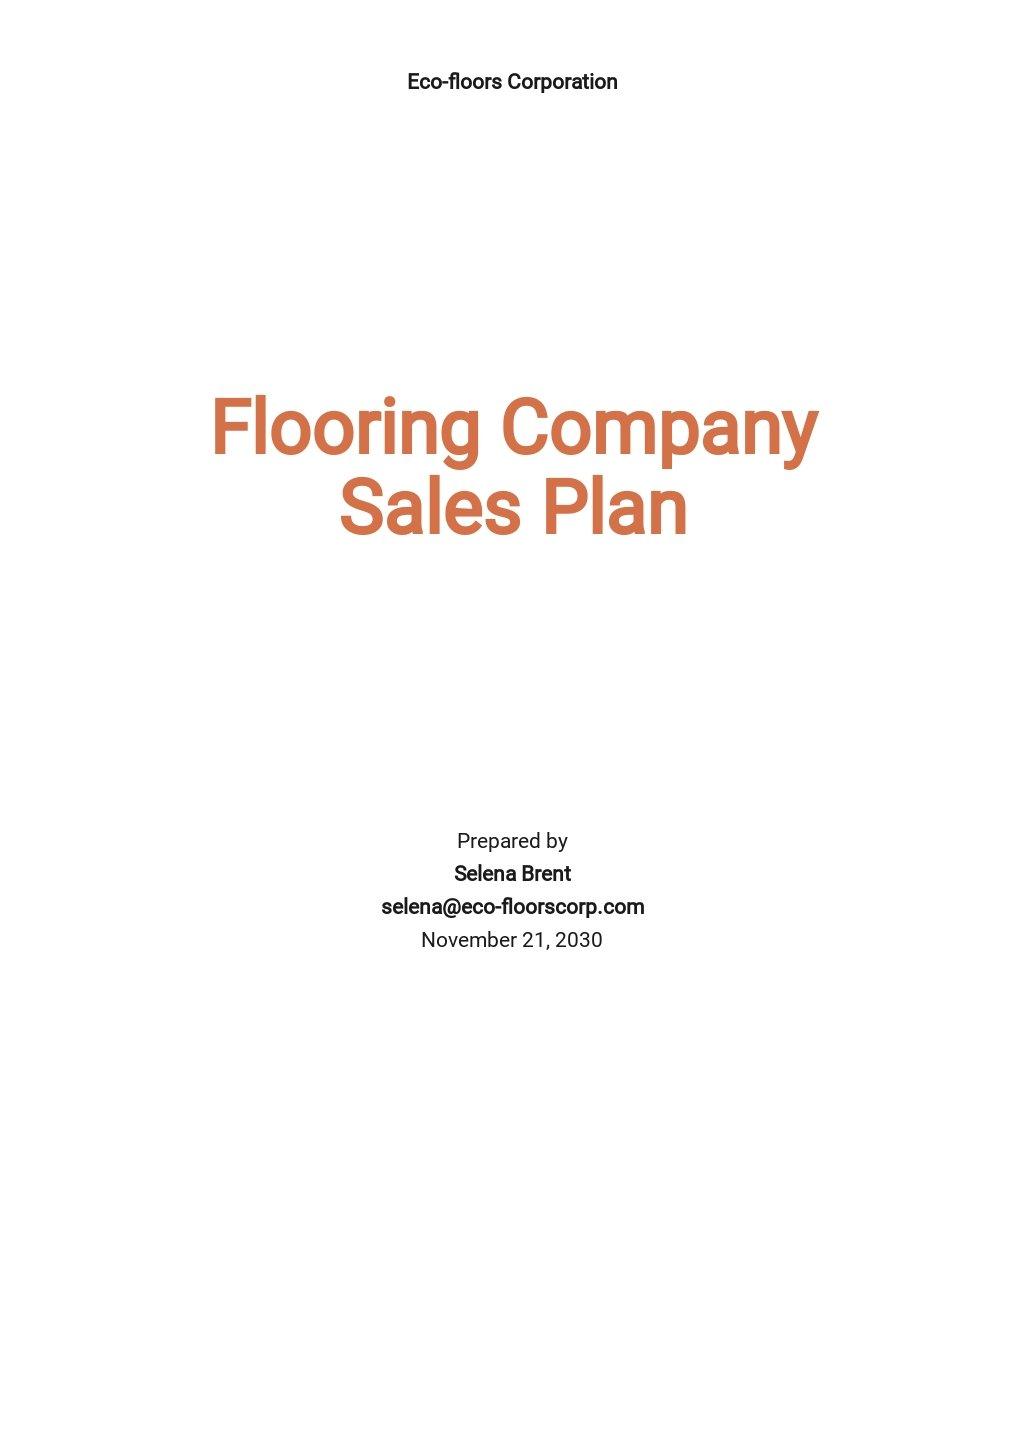 Flooring company Sales Plan Template